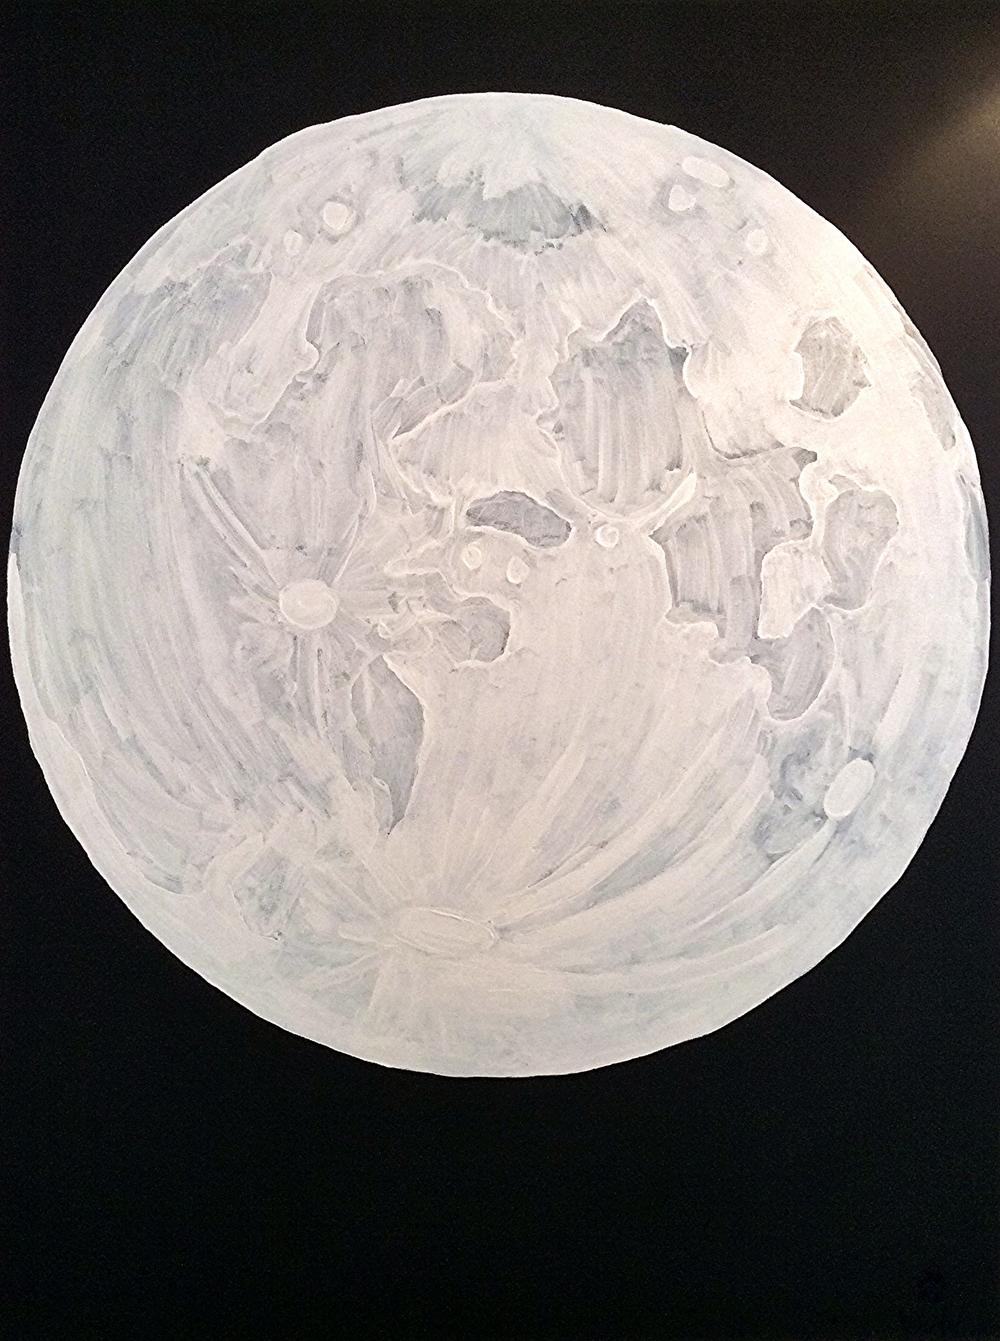 Full Moon (NORTH)